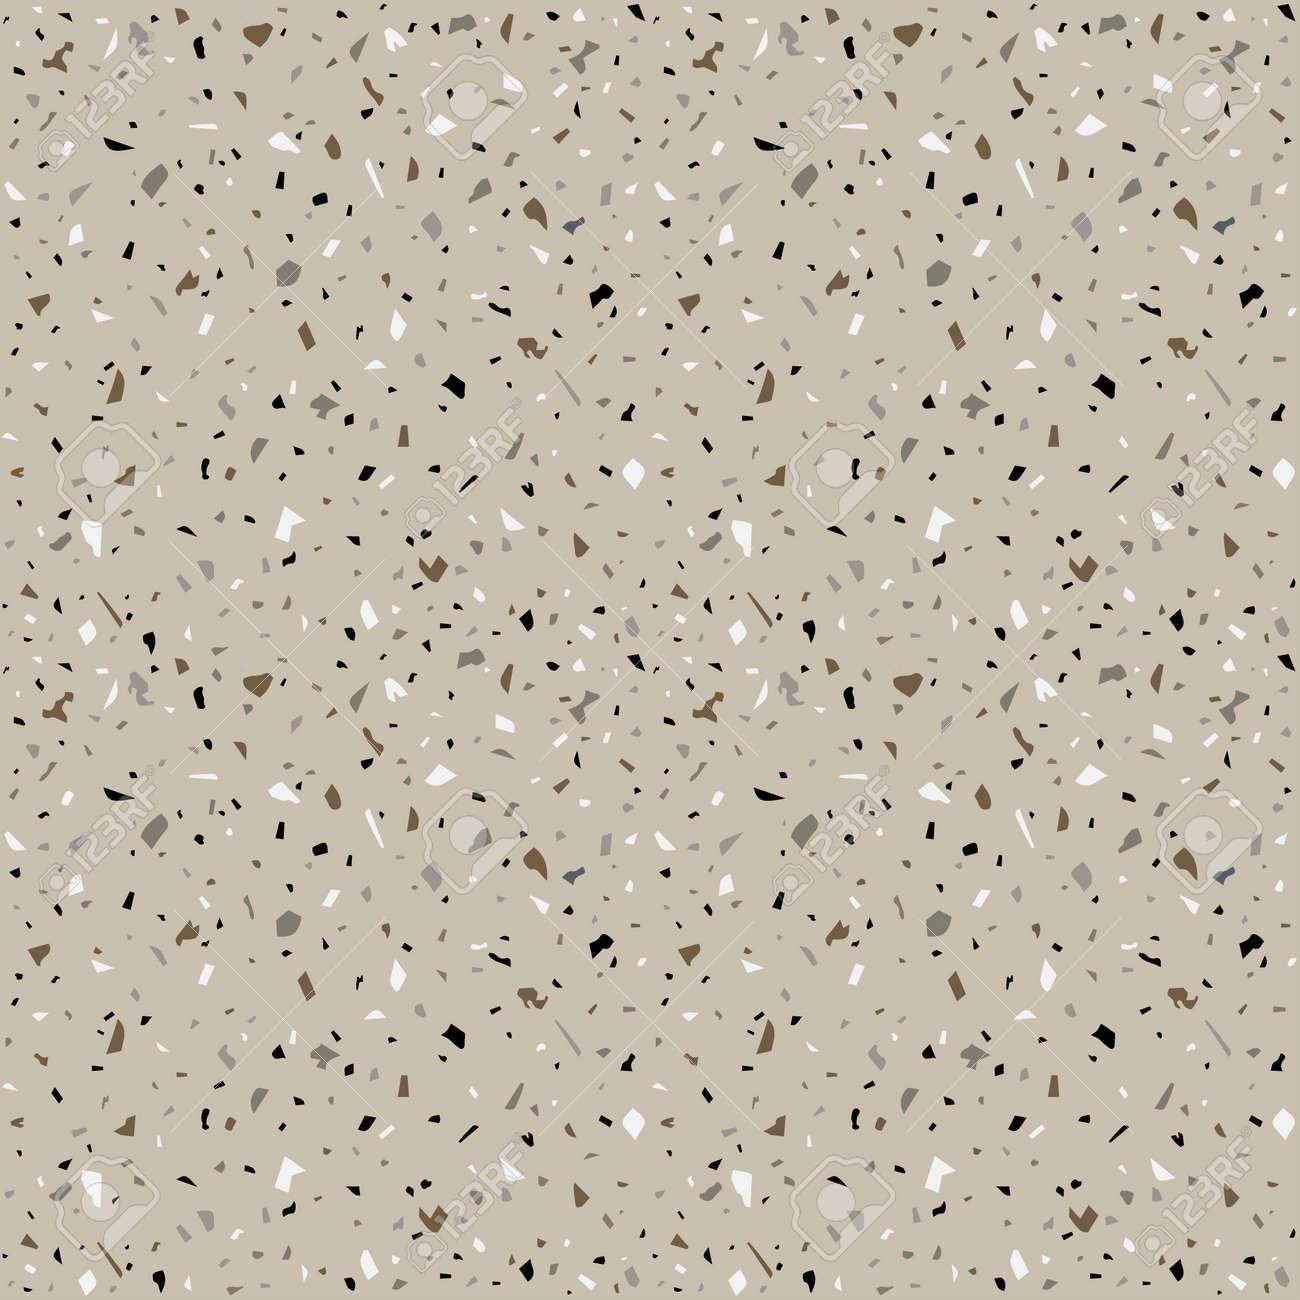 Granite stone terrazzo floor texture  Abstract background, seamless